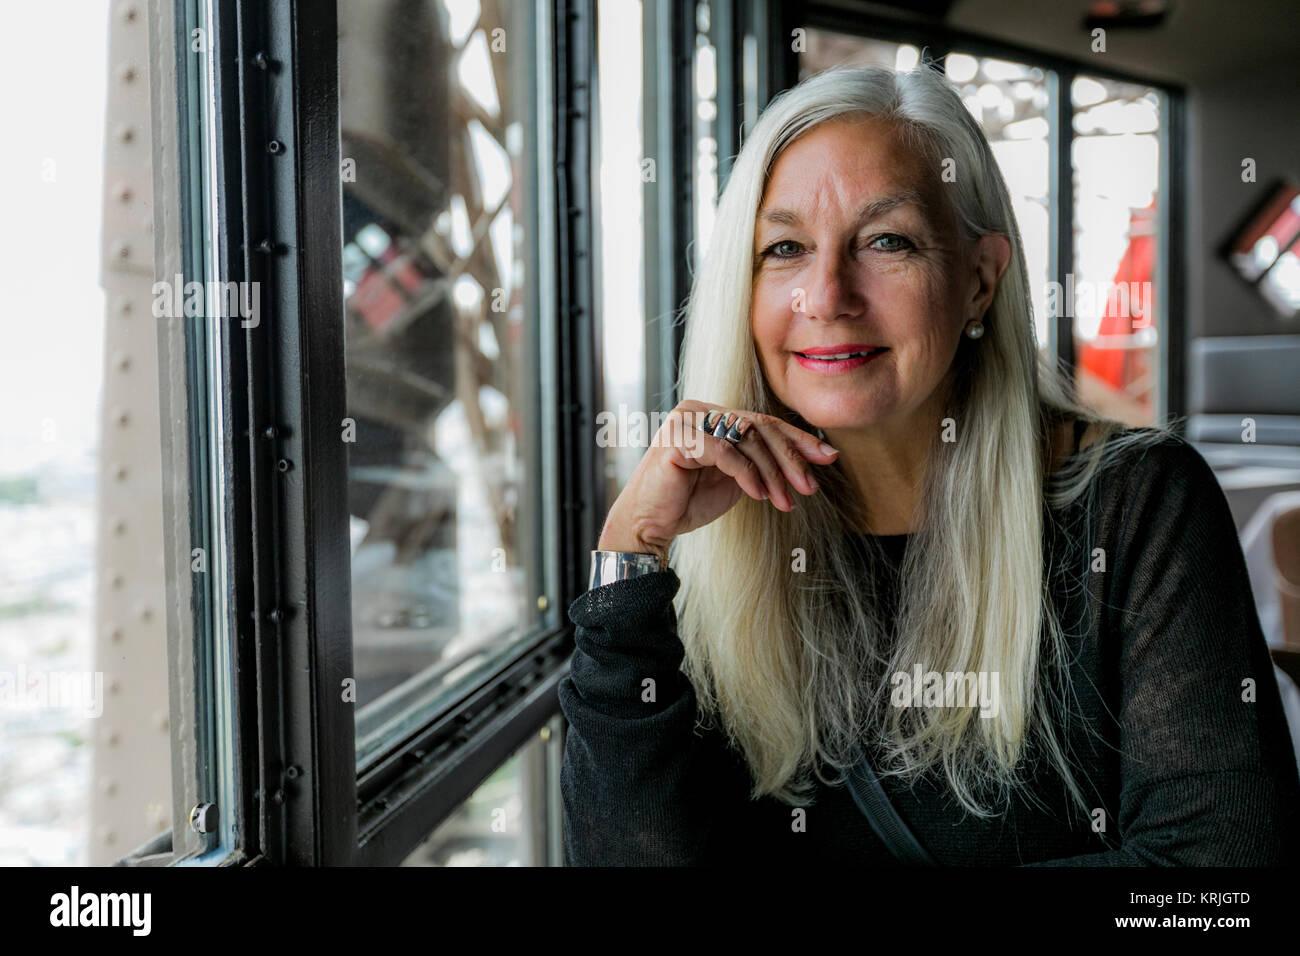 Portrait of smiling Caucasian woman near window - Stock Image